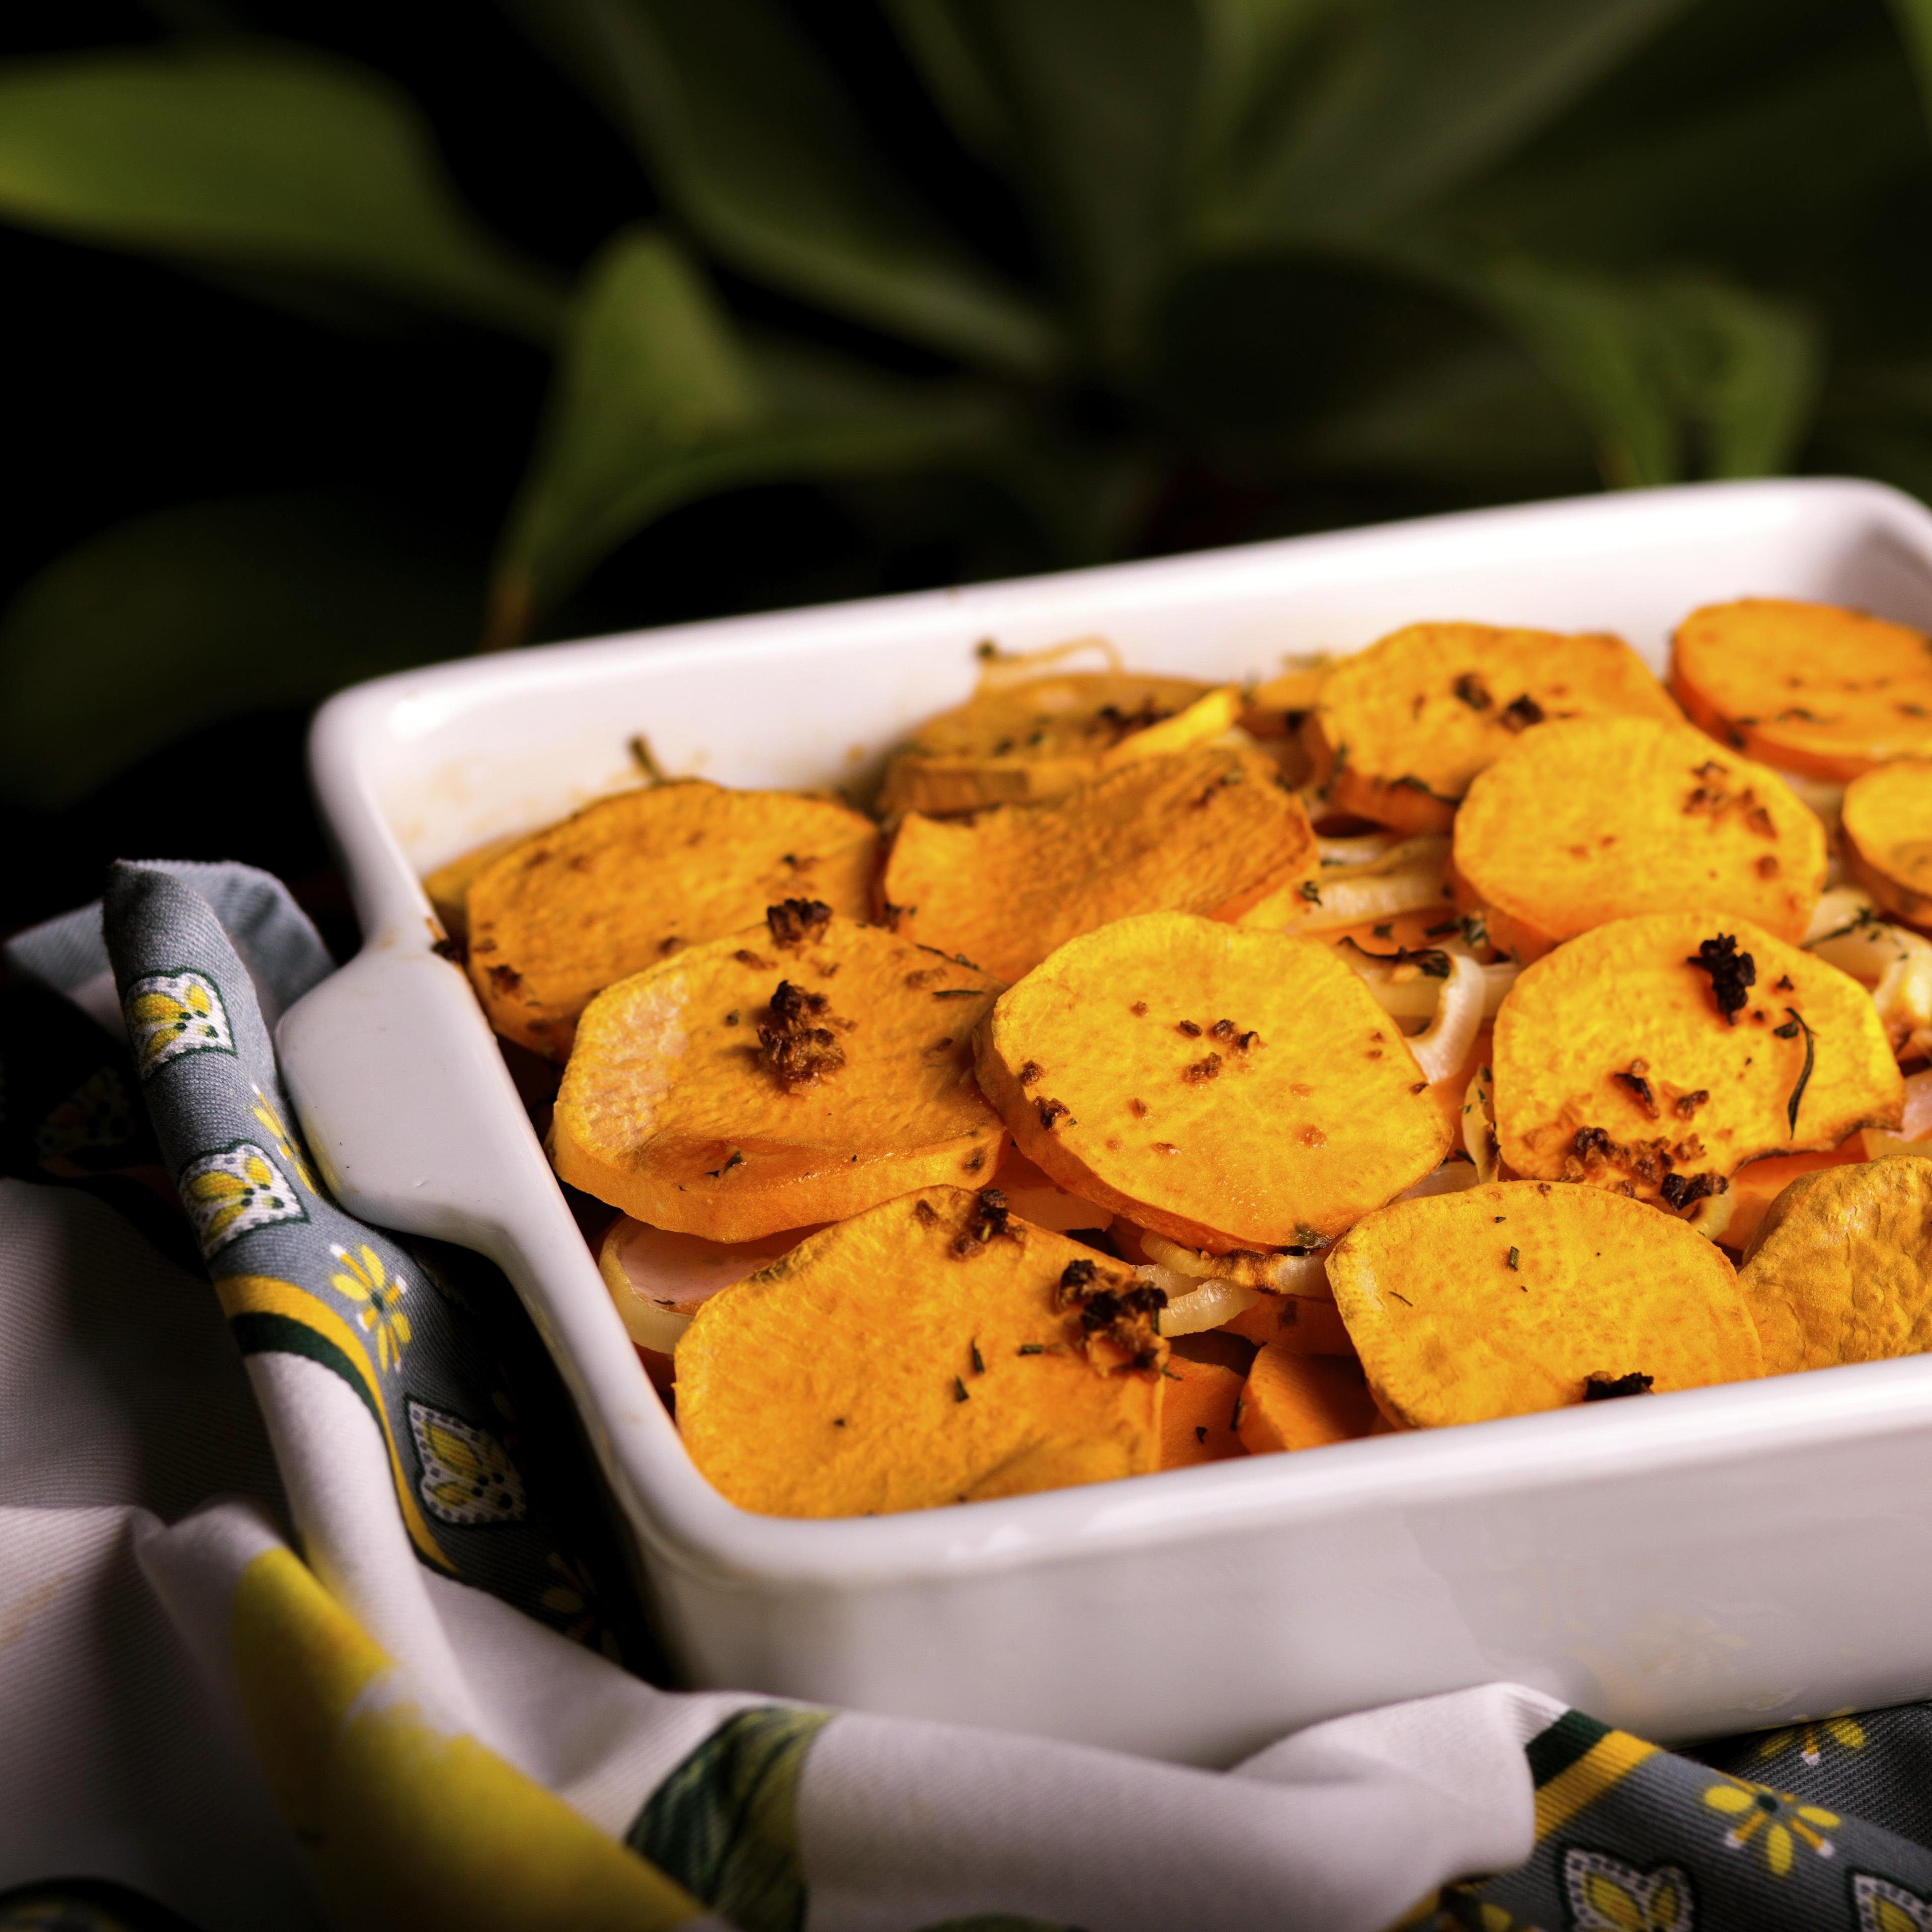 HWKIP Scalloped Sweet Potatoes